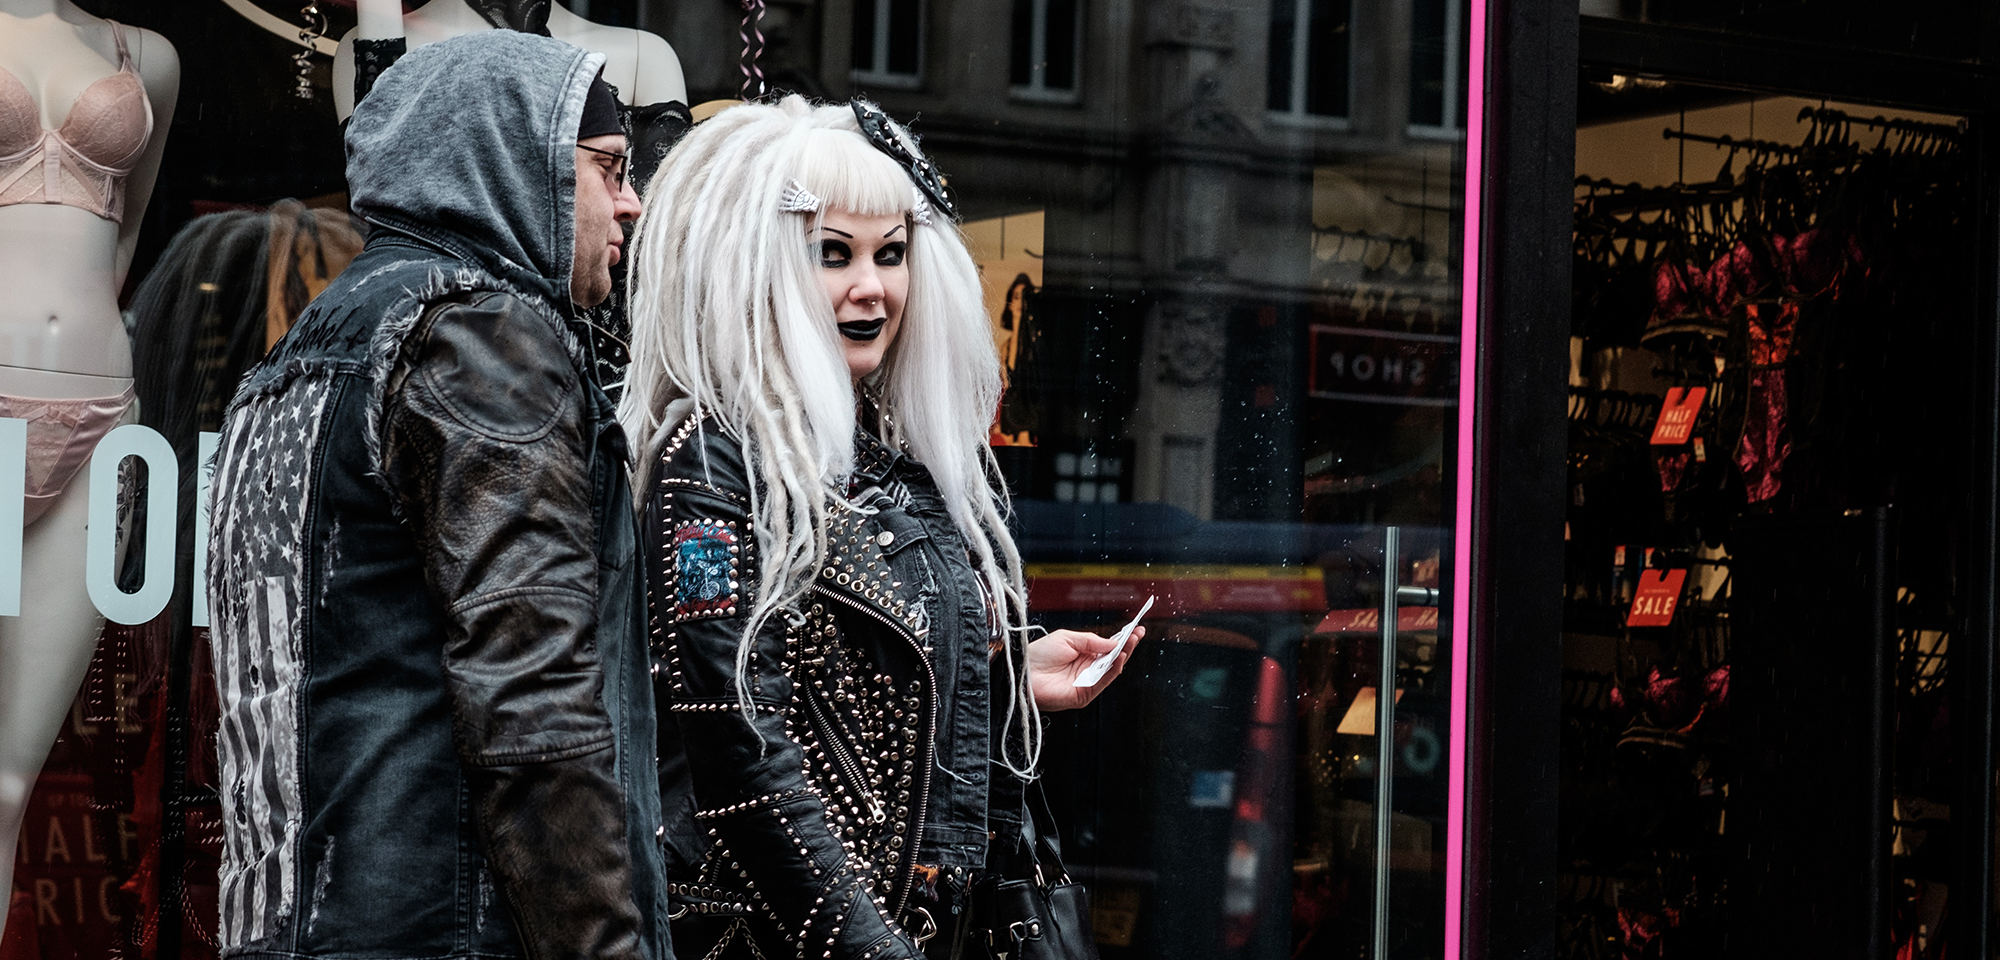 Adults in goth attire.